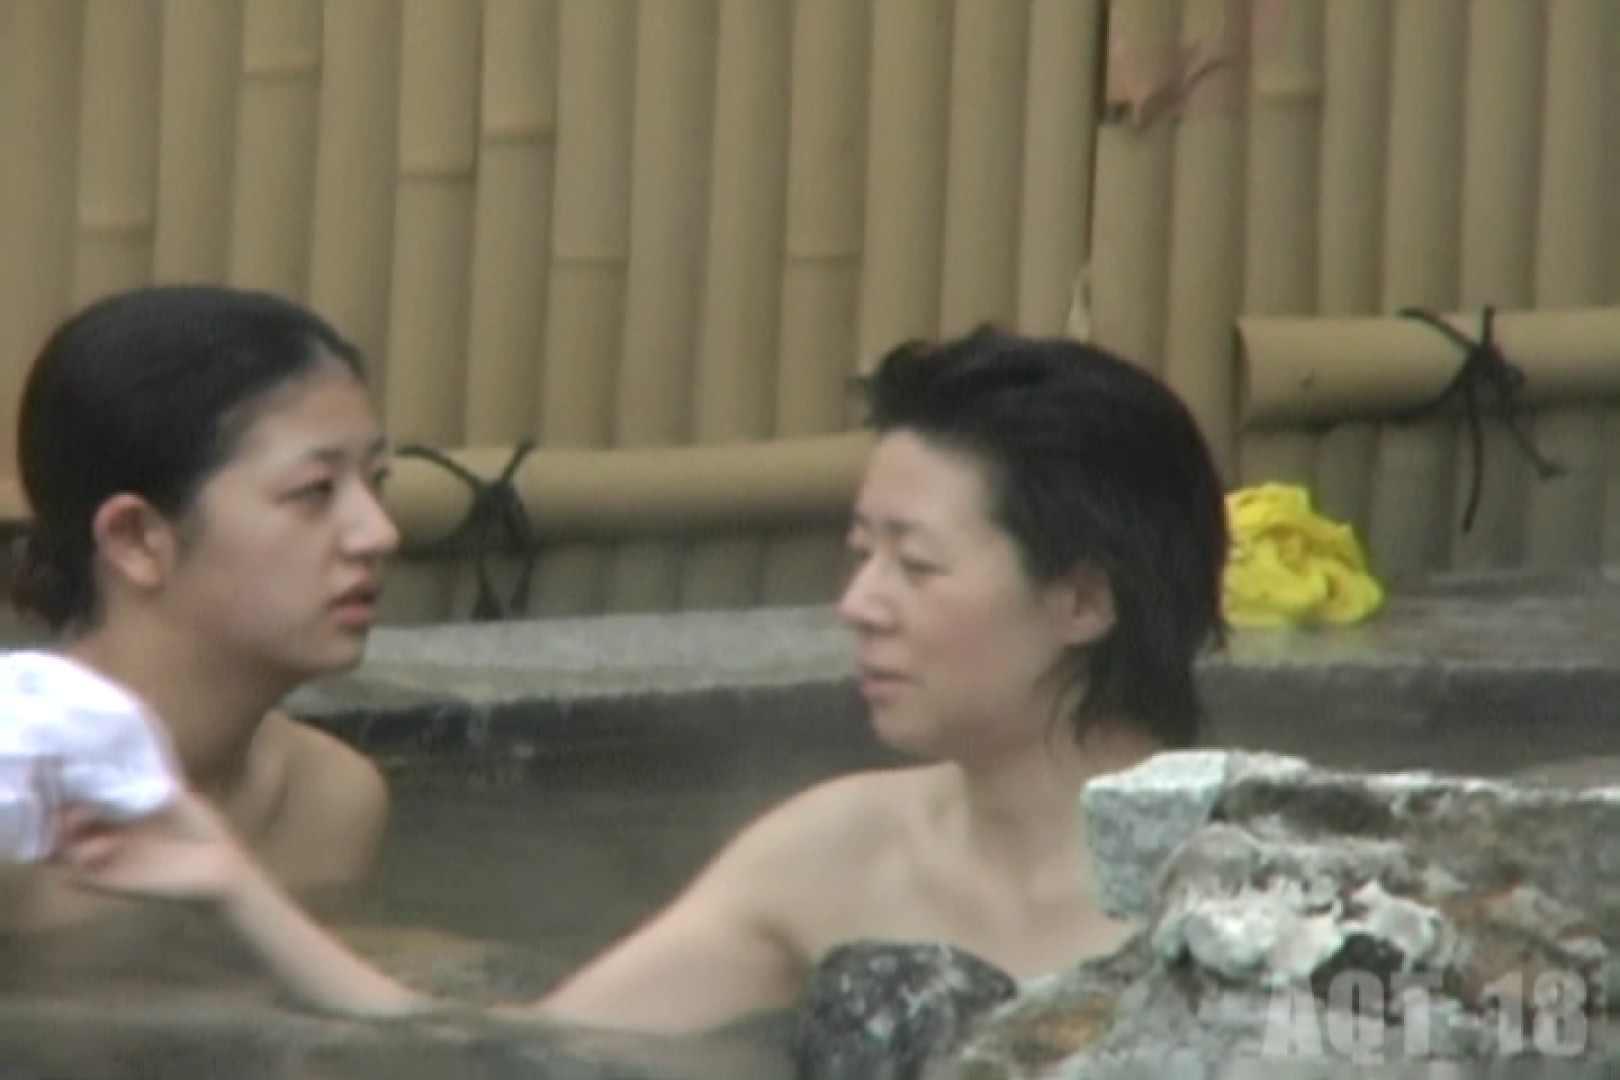 Aquaな露天風呂Vol.859 盗撮 戯れ無修正画像 76連発 5